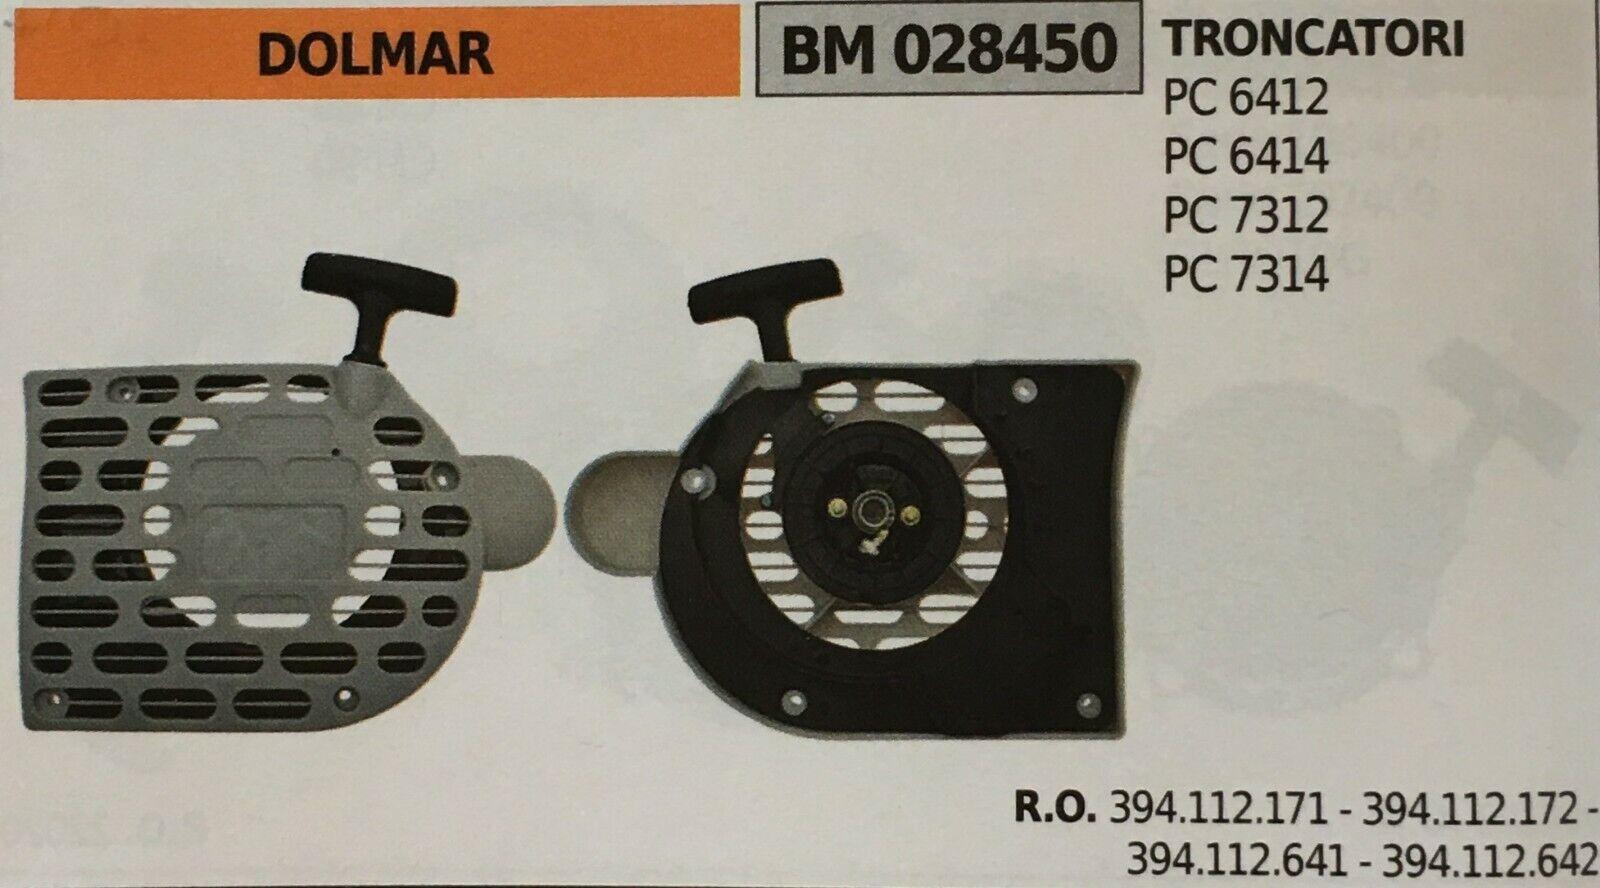 Start Komplett Brumar Dolmar BM028450